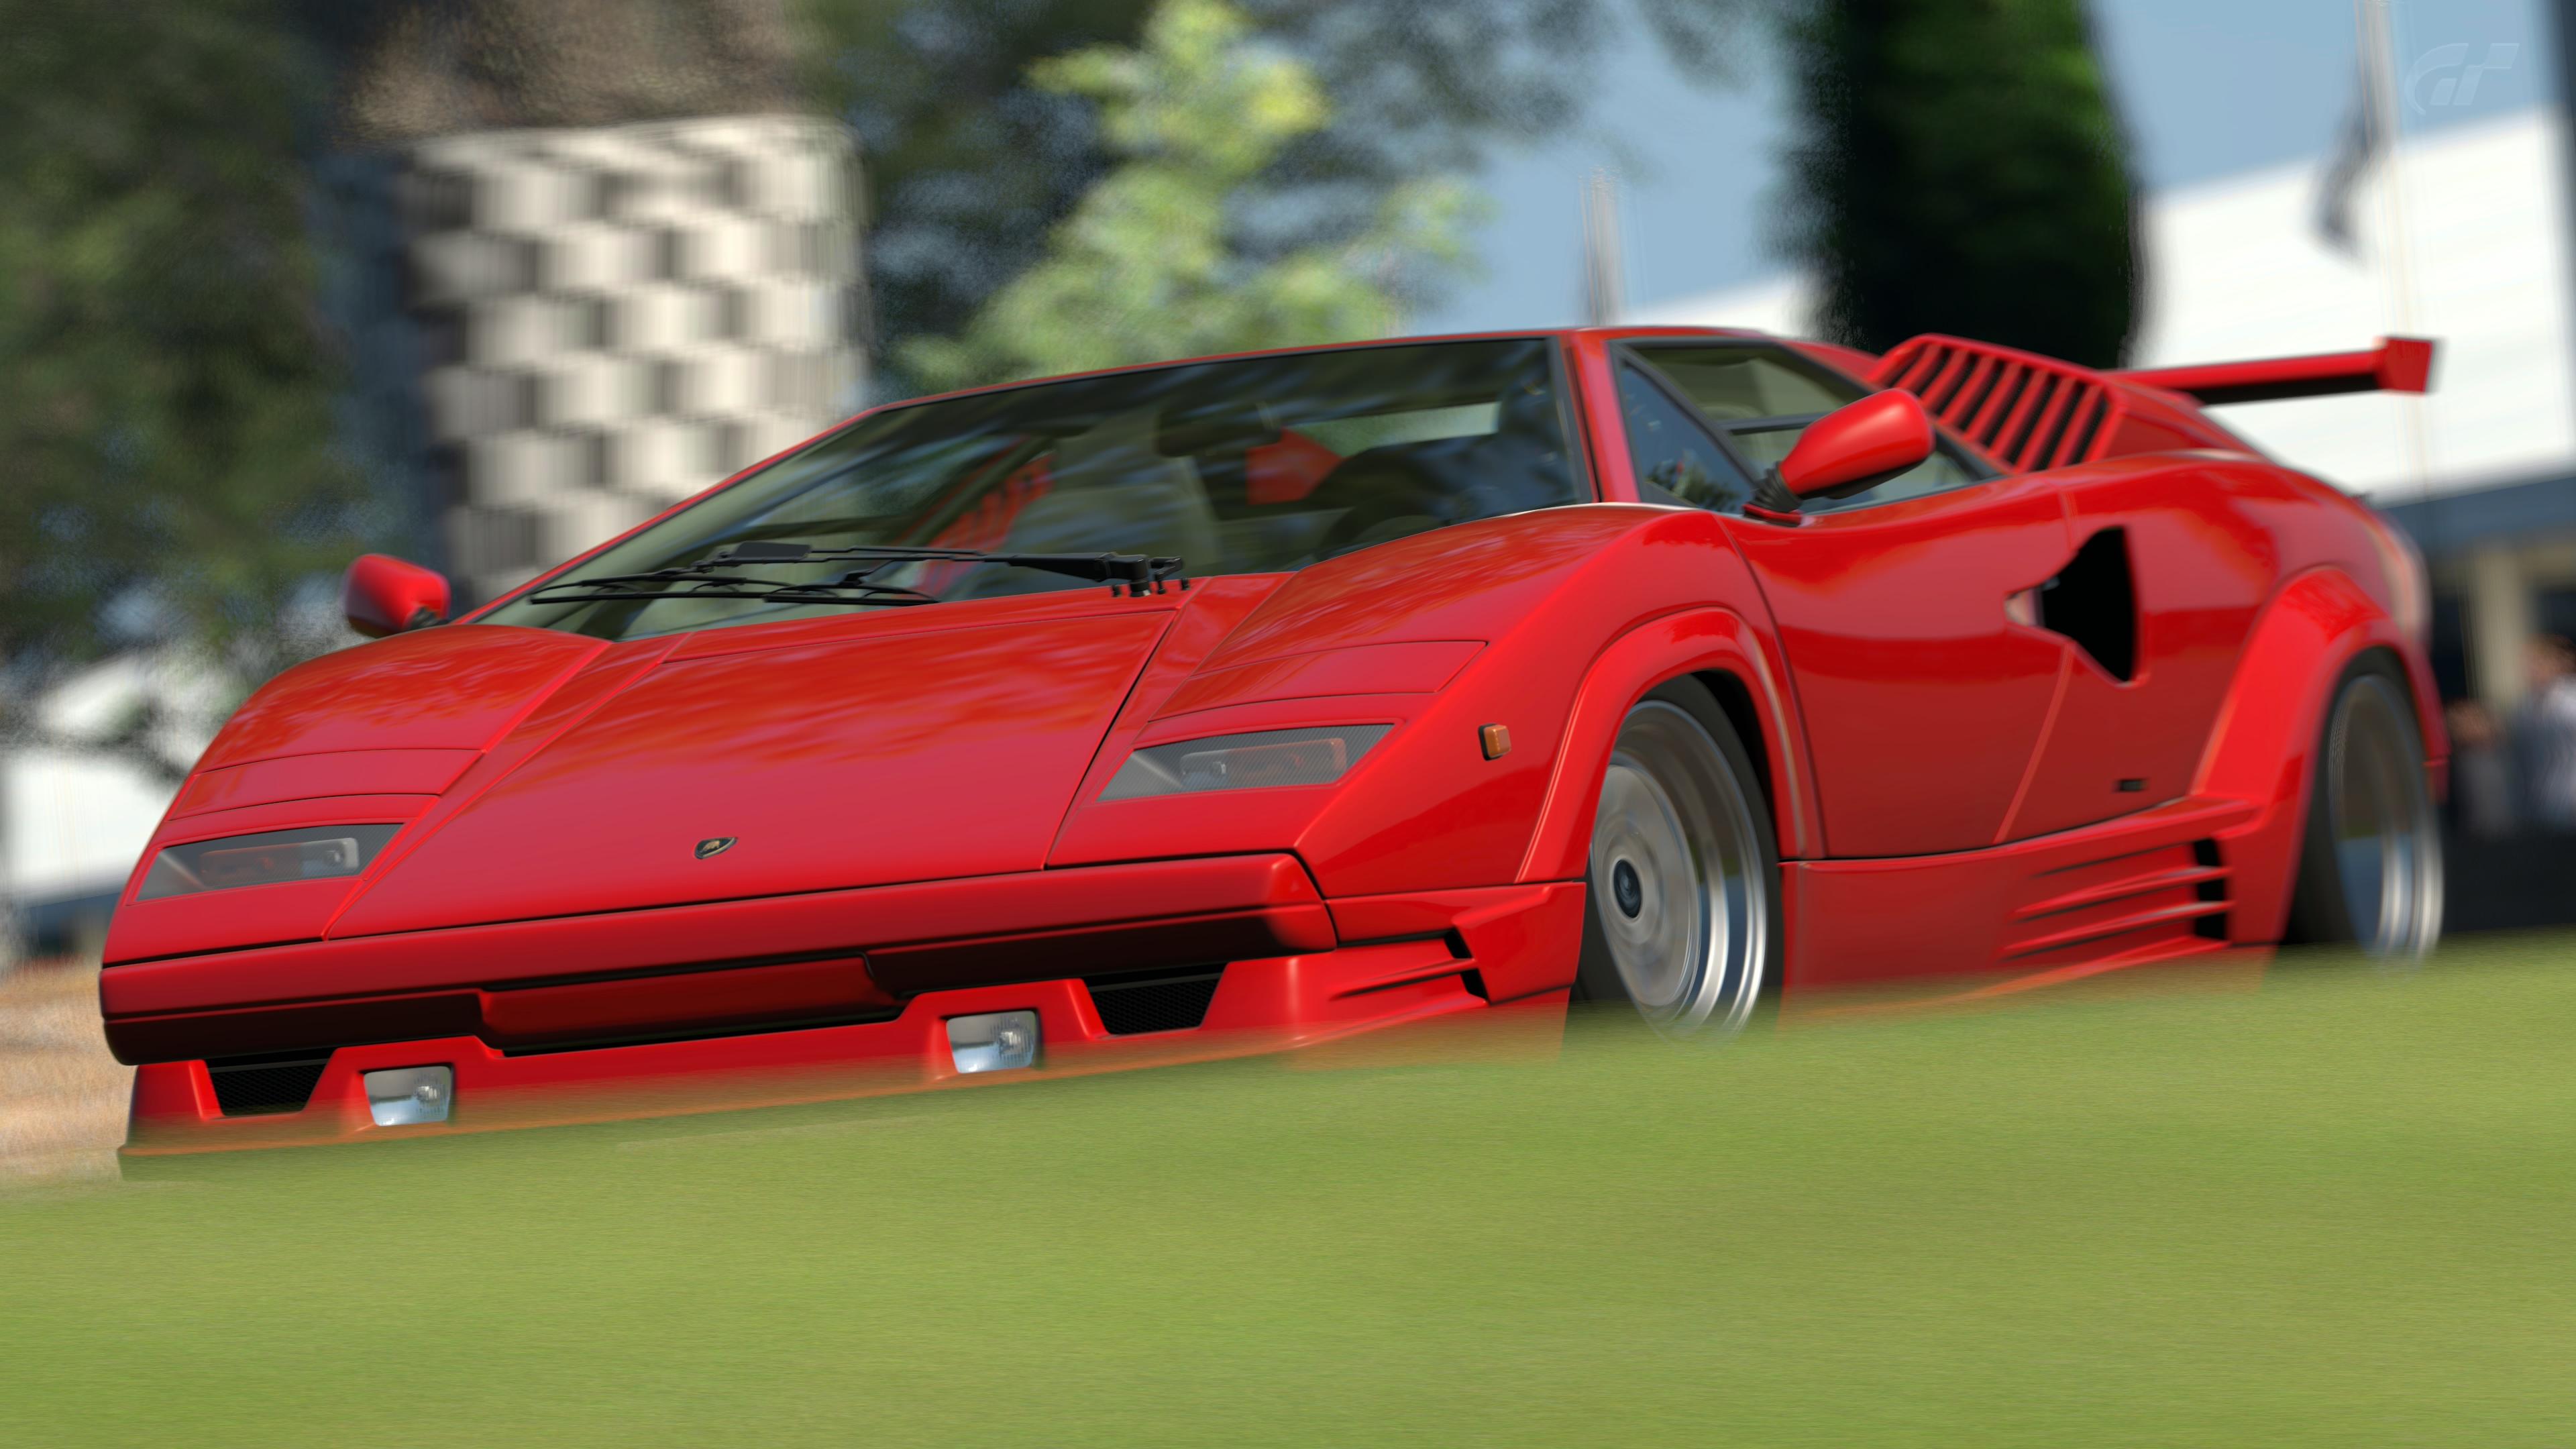 lamborghini_countach_25th_anniversary__gt6__by_vertualissimo-d7ht88x Elegant Lamborghini Countach 25th Anniversary Specs Cars Trend